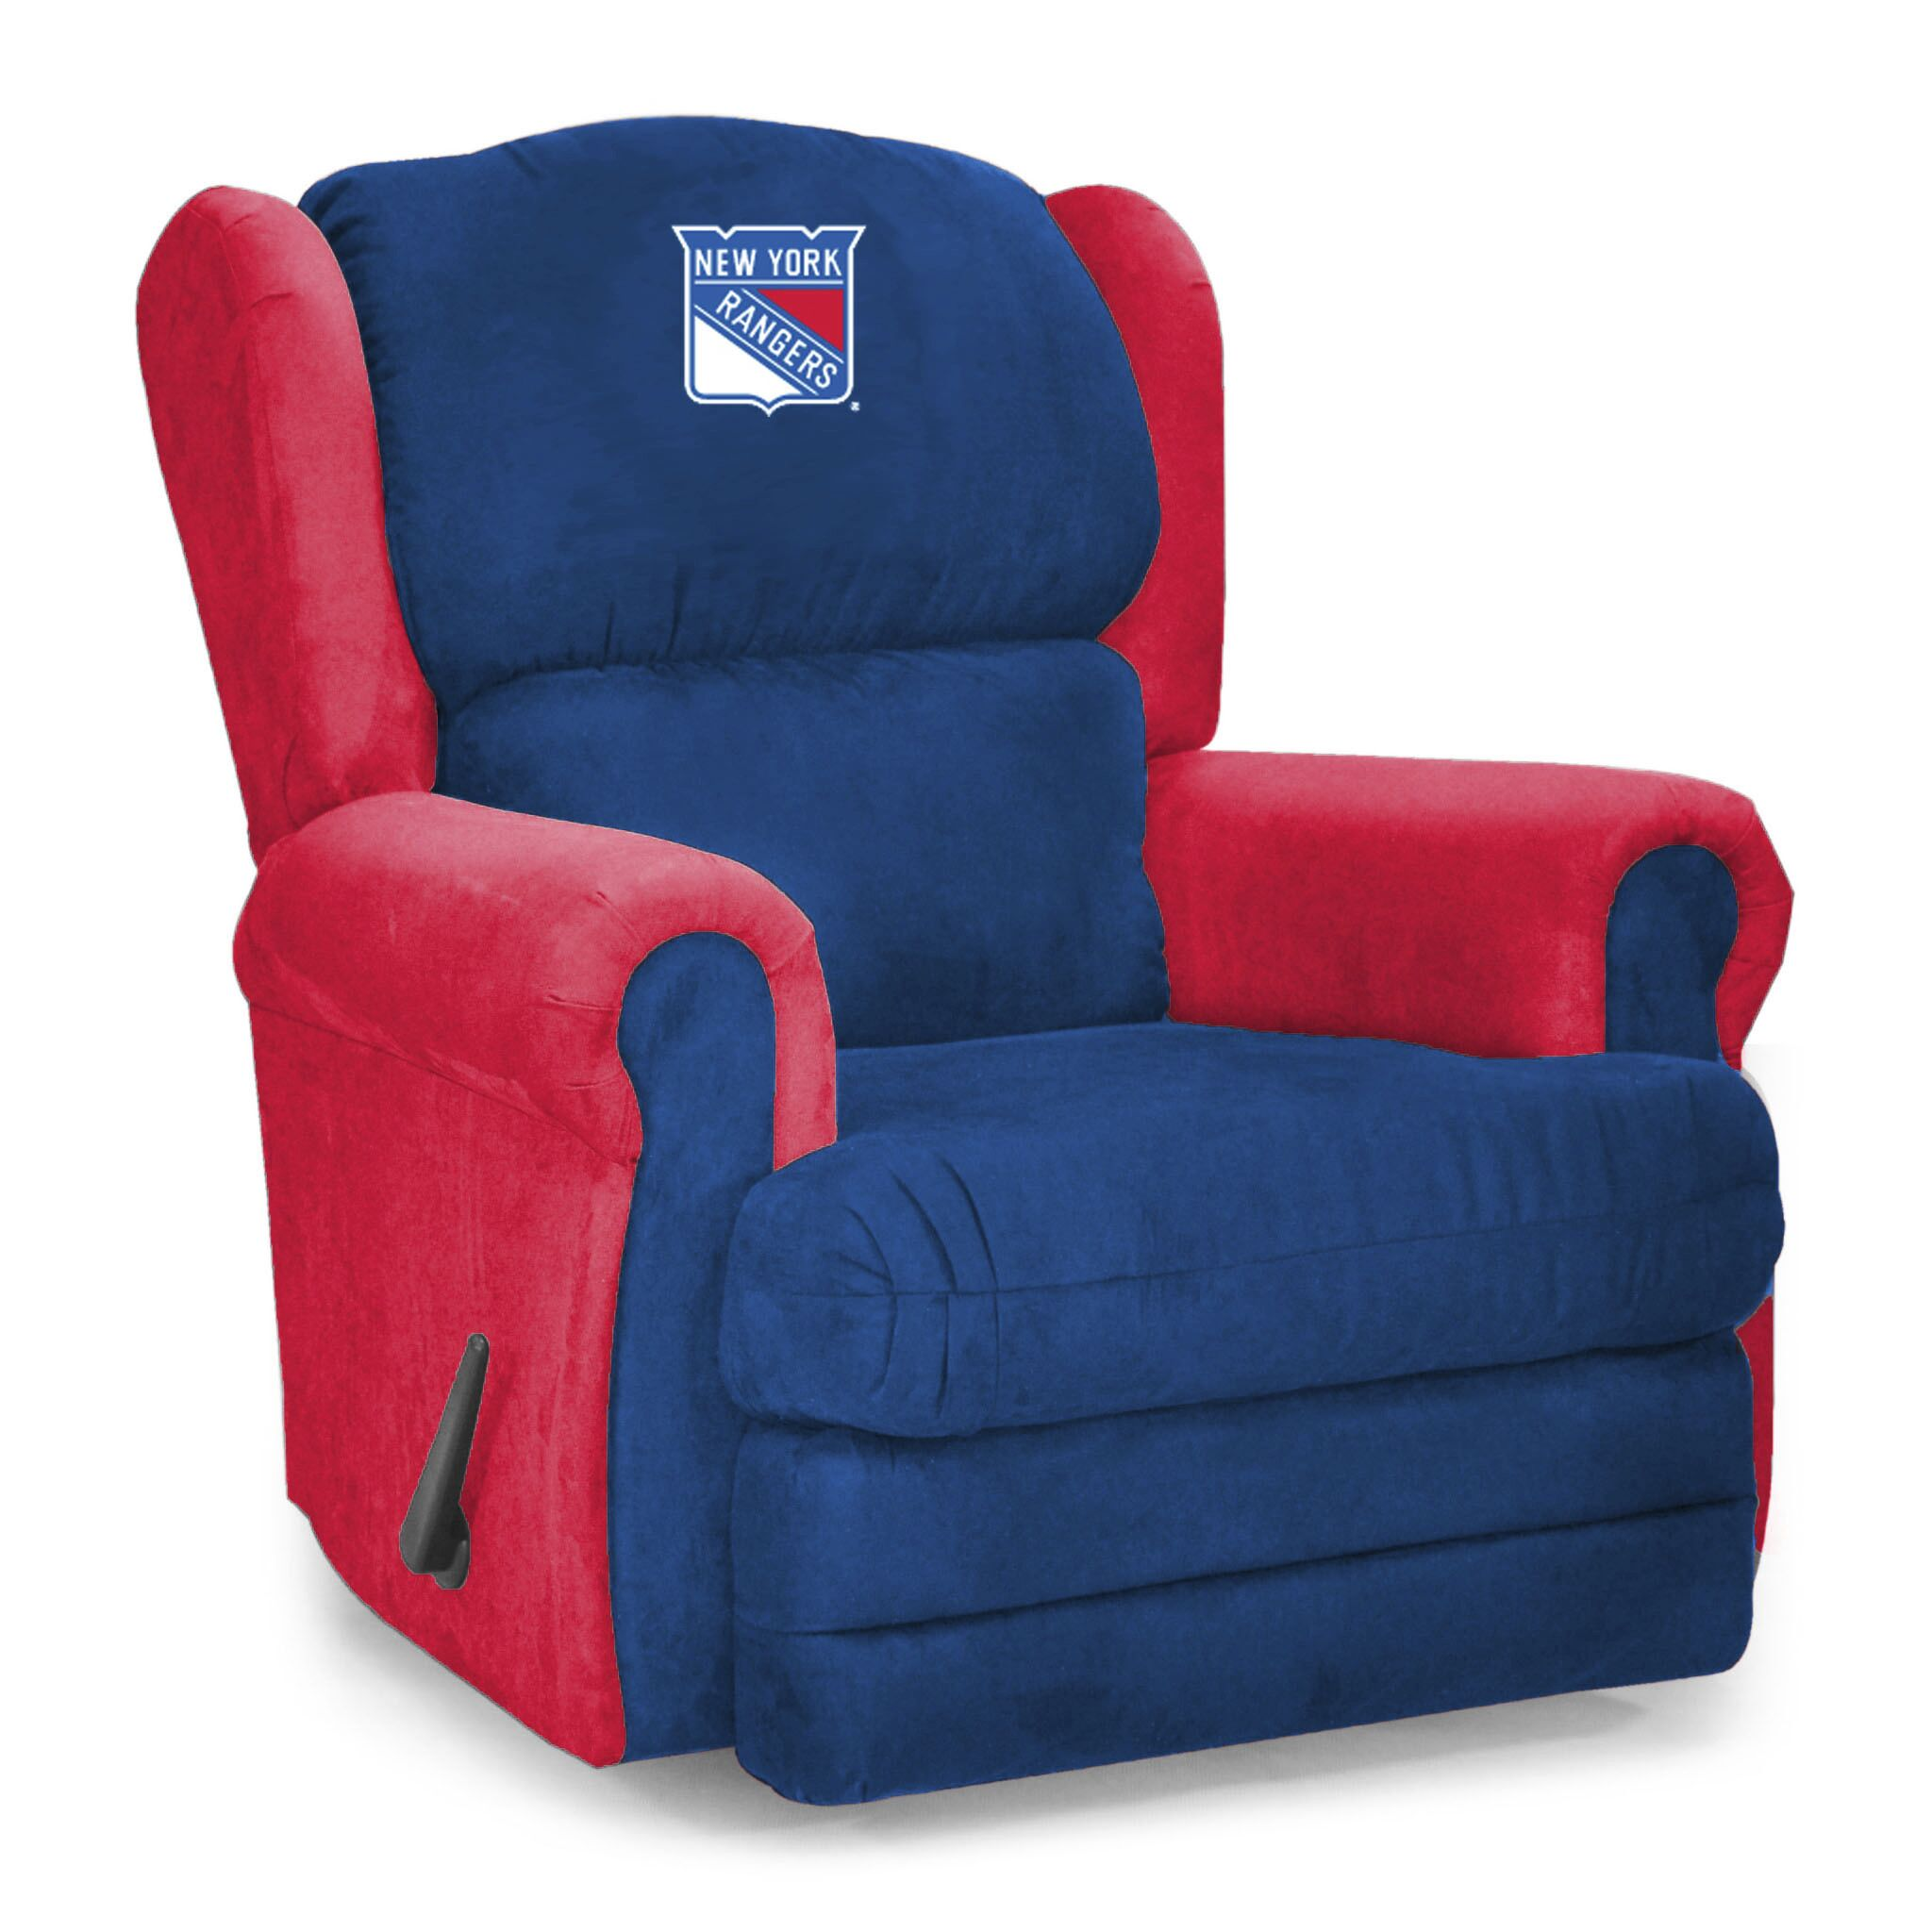 Coach Microfiber Recliner NHL Team: New York Rangers®